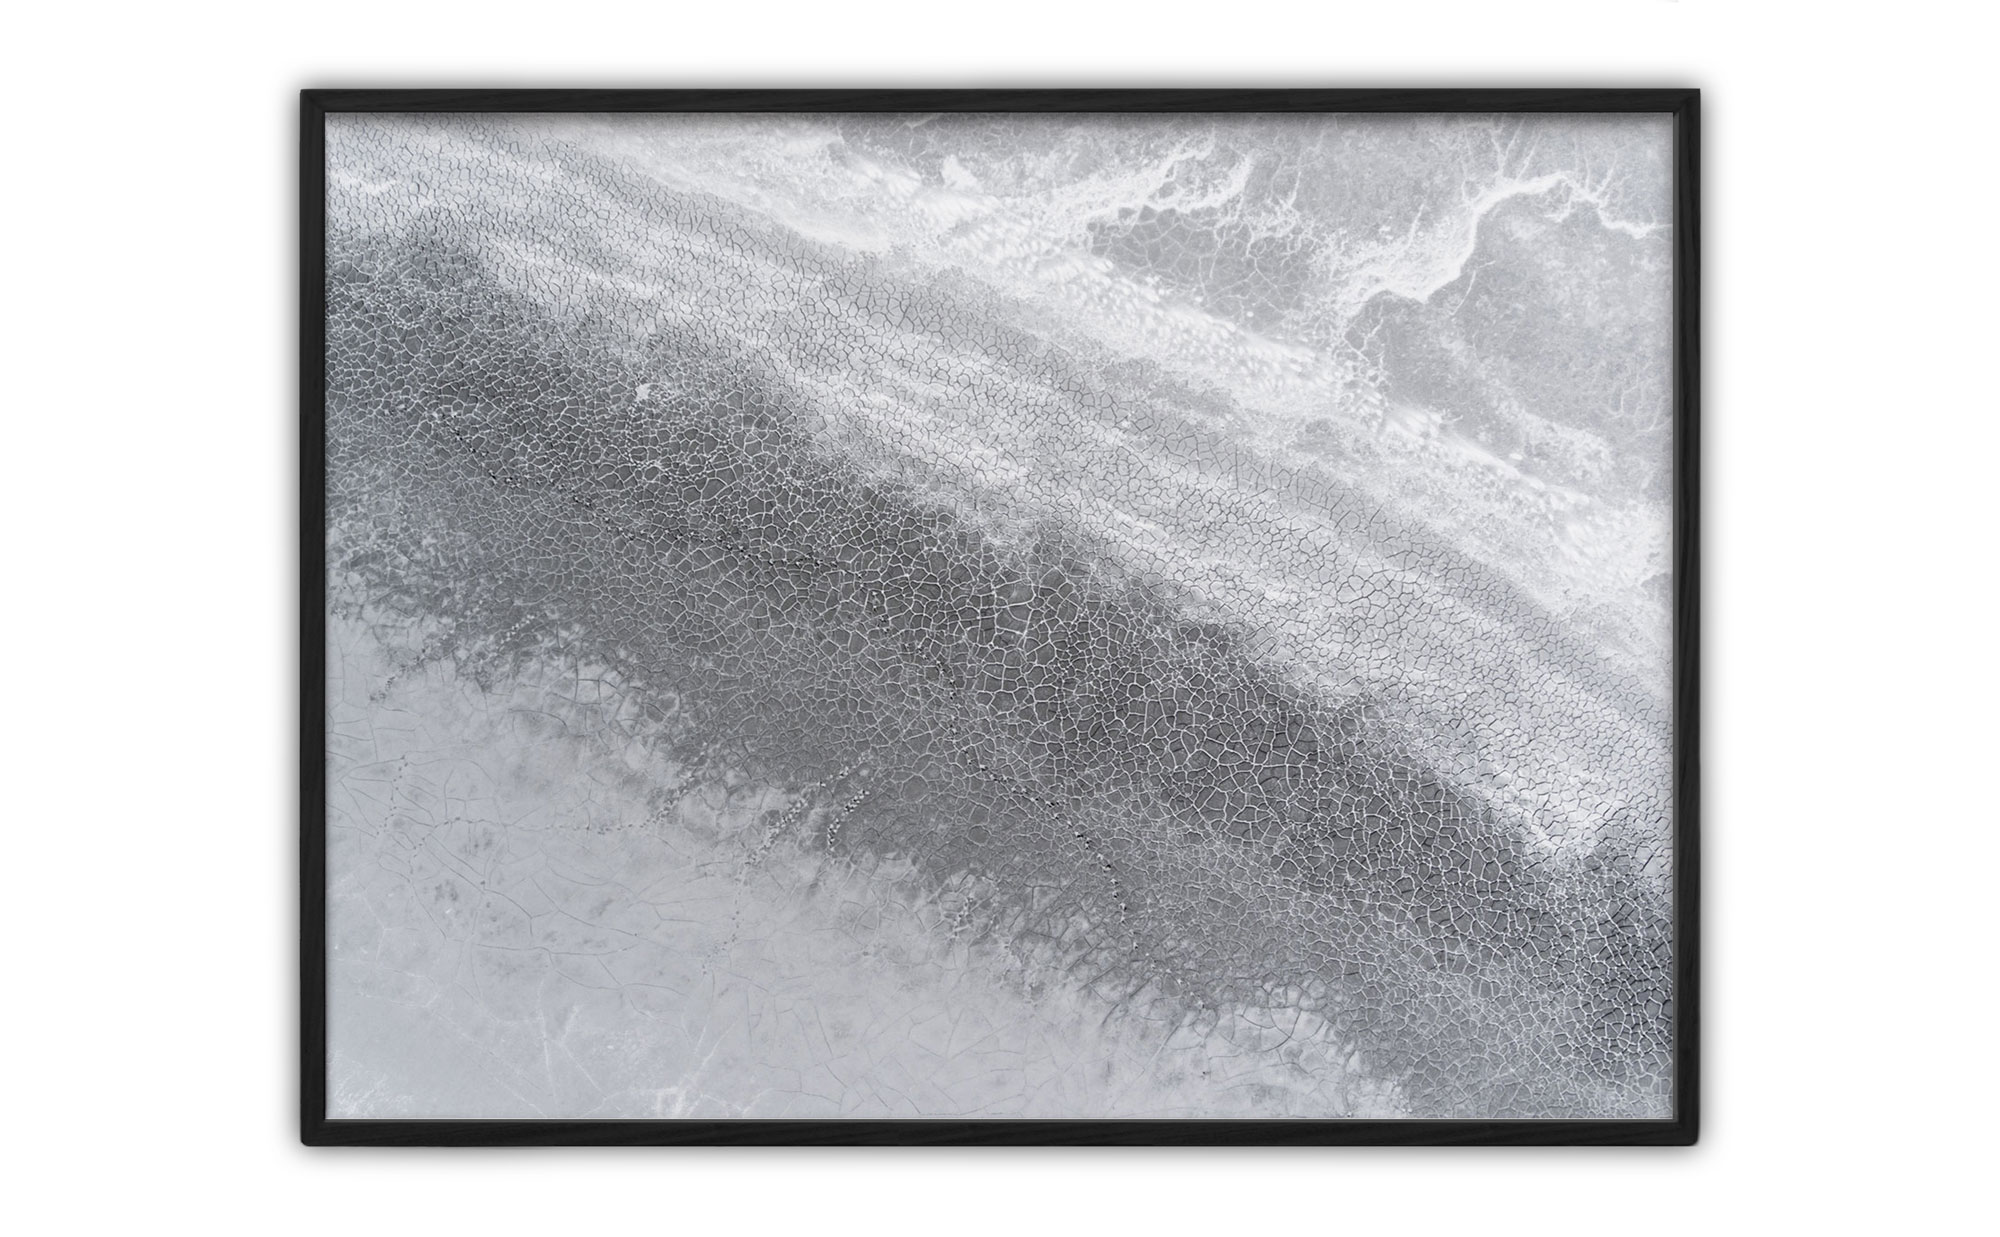 Maegan_Brown_Salt_Stone_07_Framed_Black.jpg